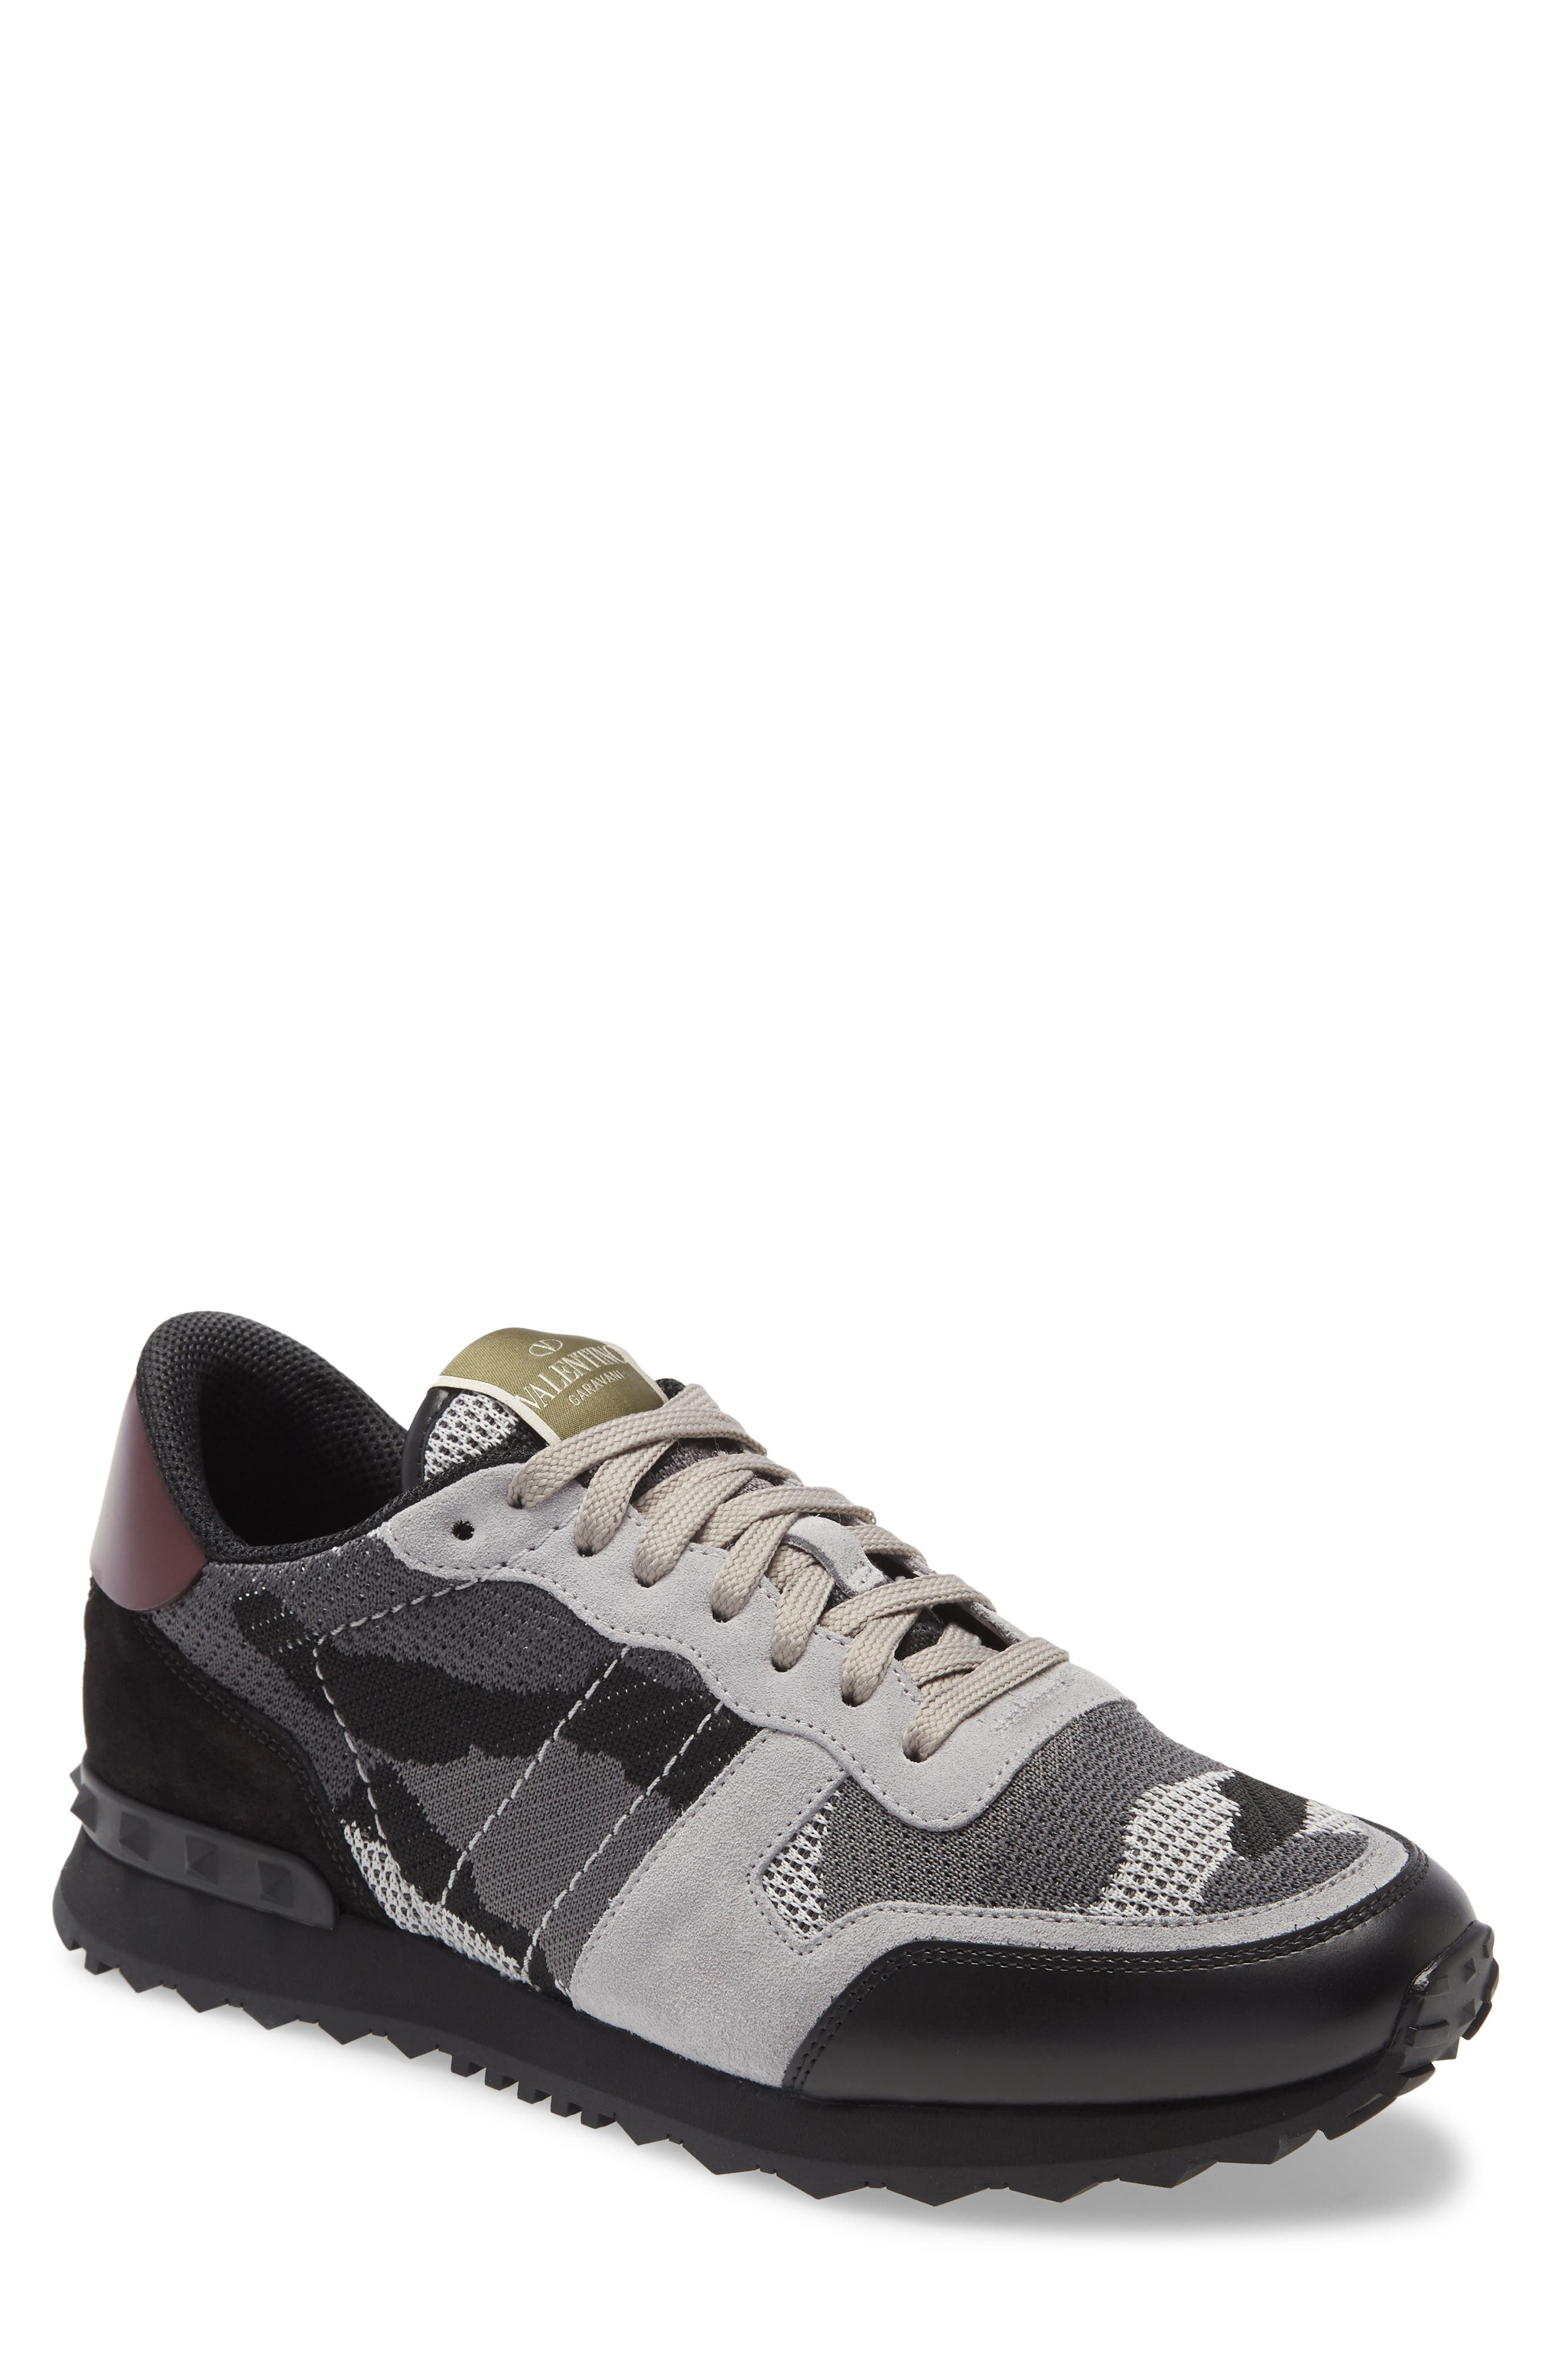 Men's Valentino Garavani Shoes | Nordstrom